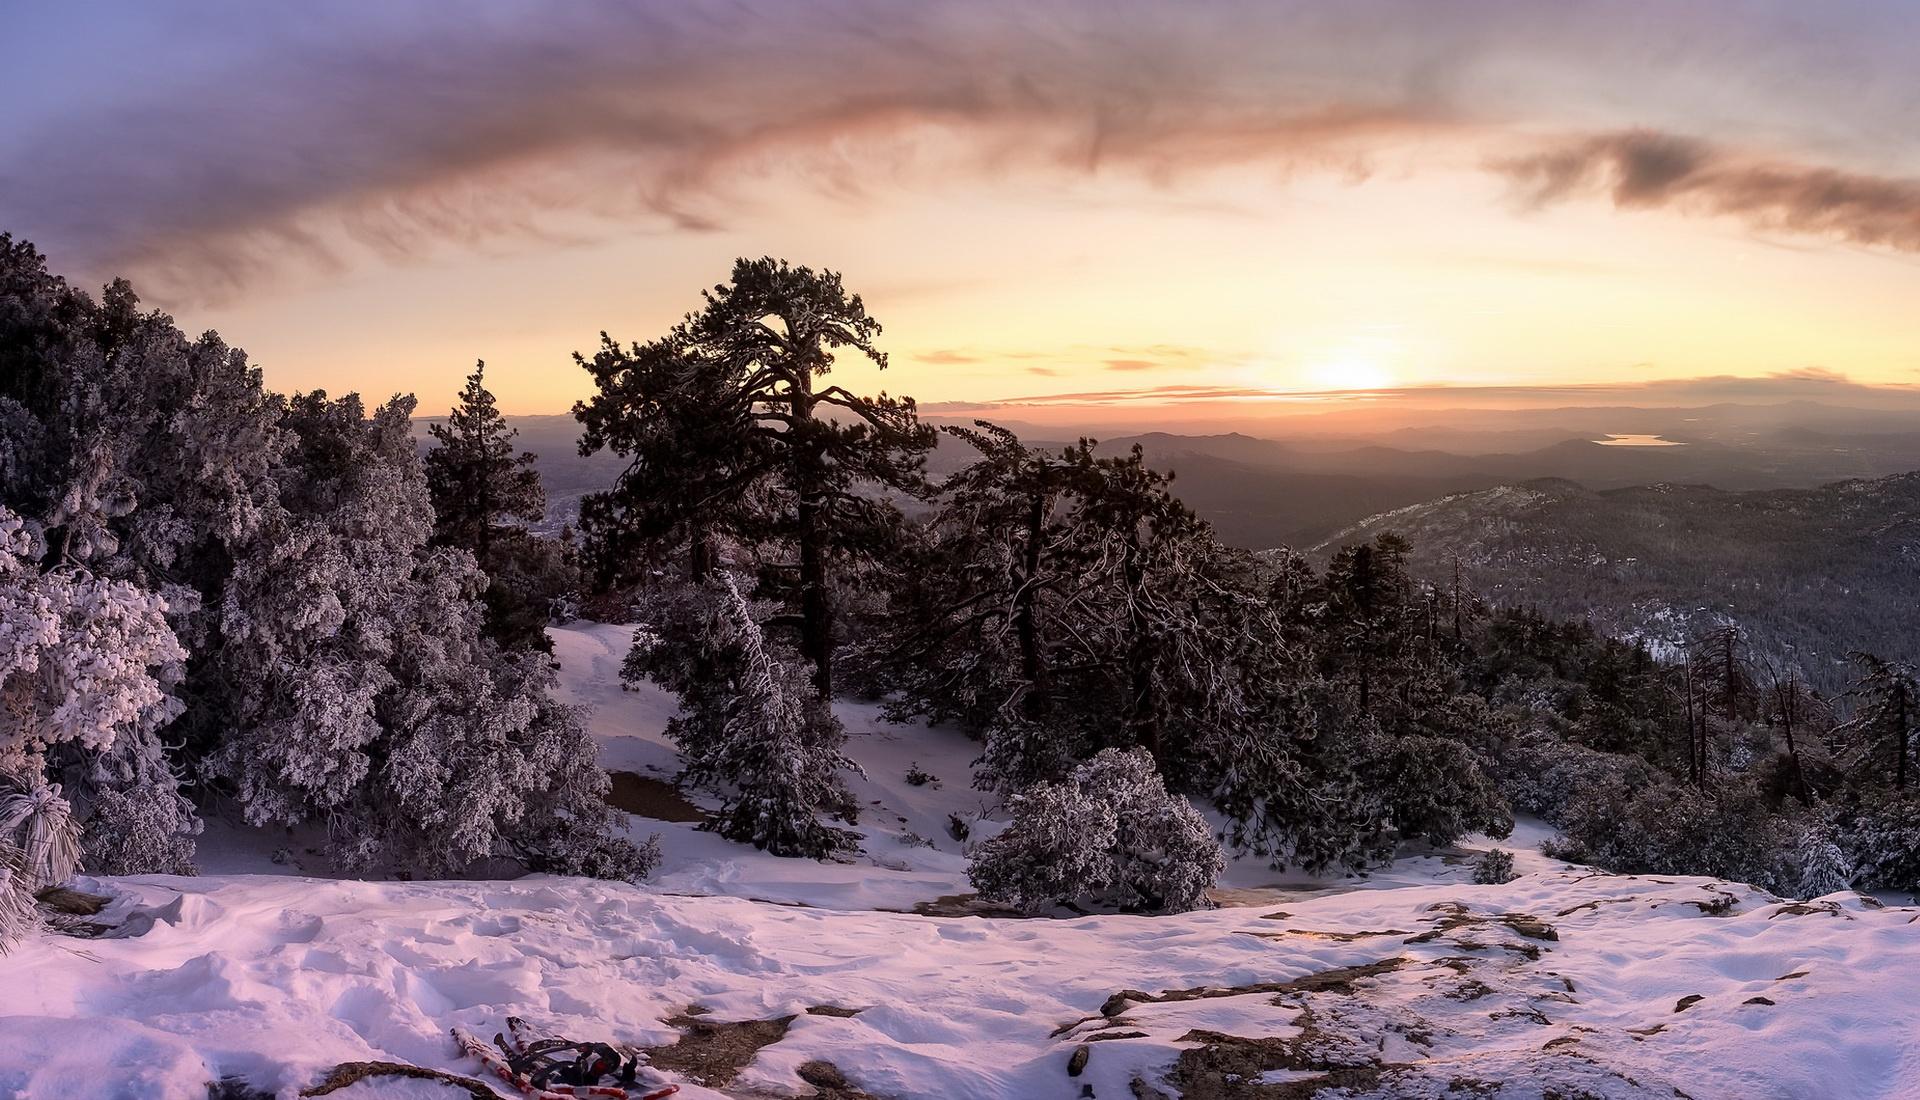 горы закат зима снег mountains sunset winter snow скачать